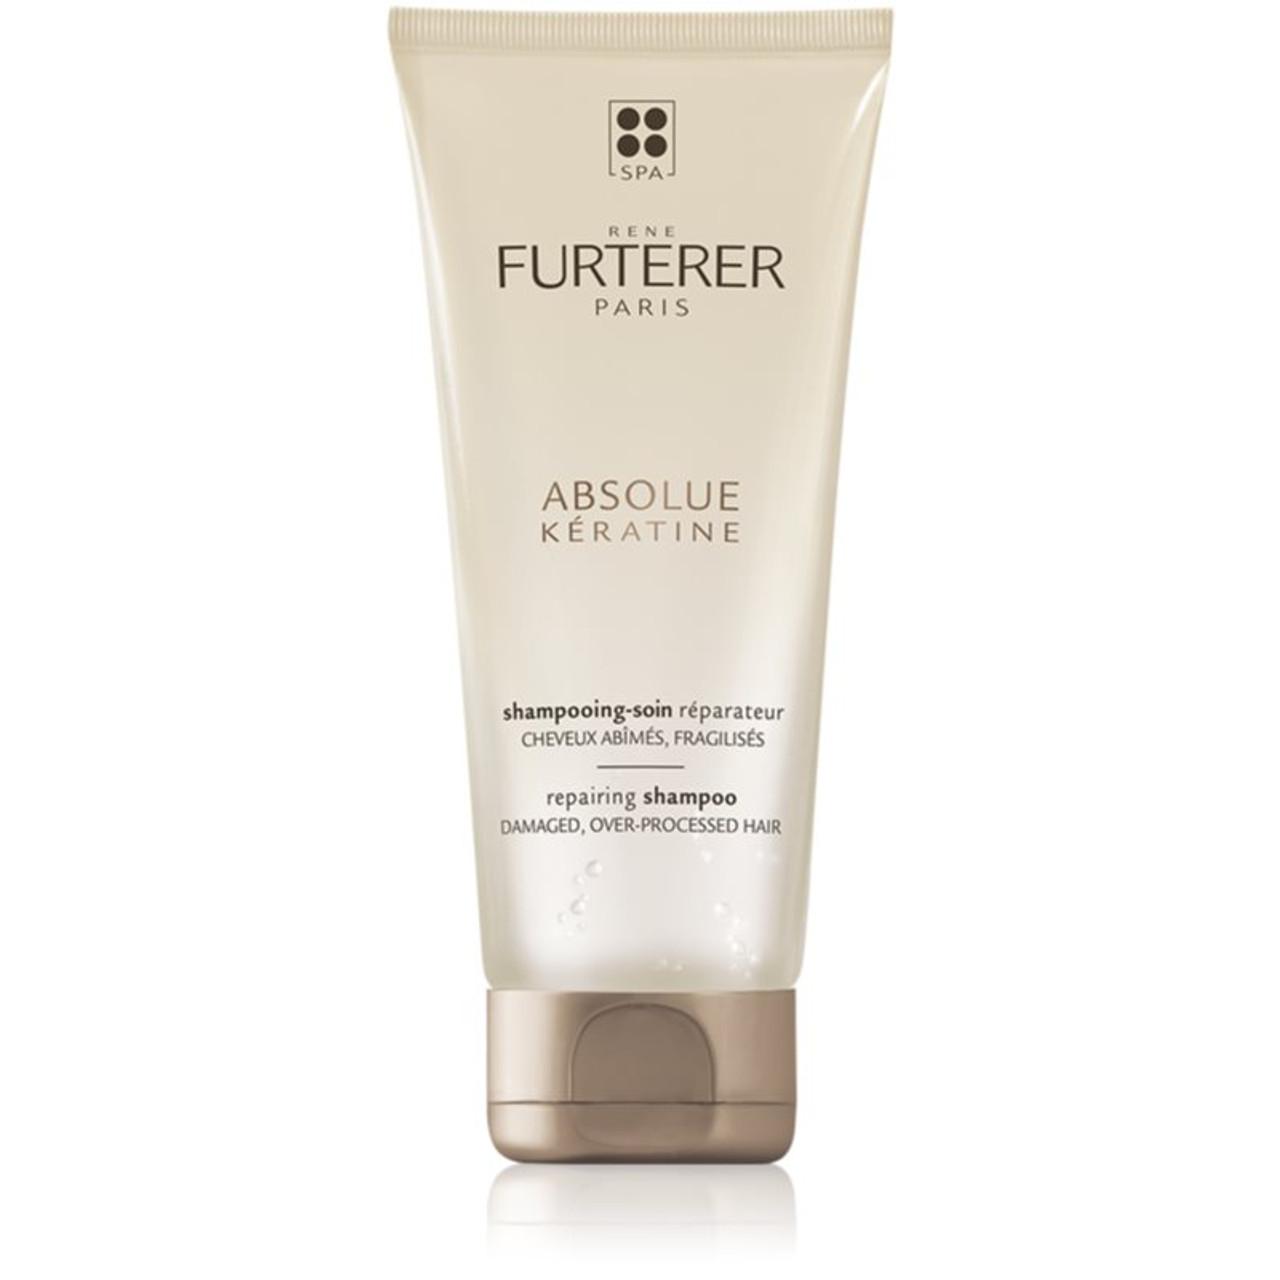 Rene Furterer Absolue Keratine Repairing Shampoo 6.7 Oz